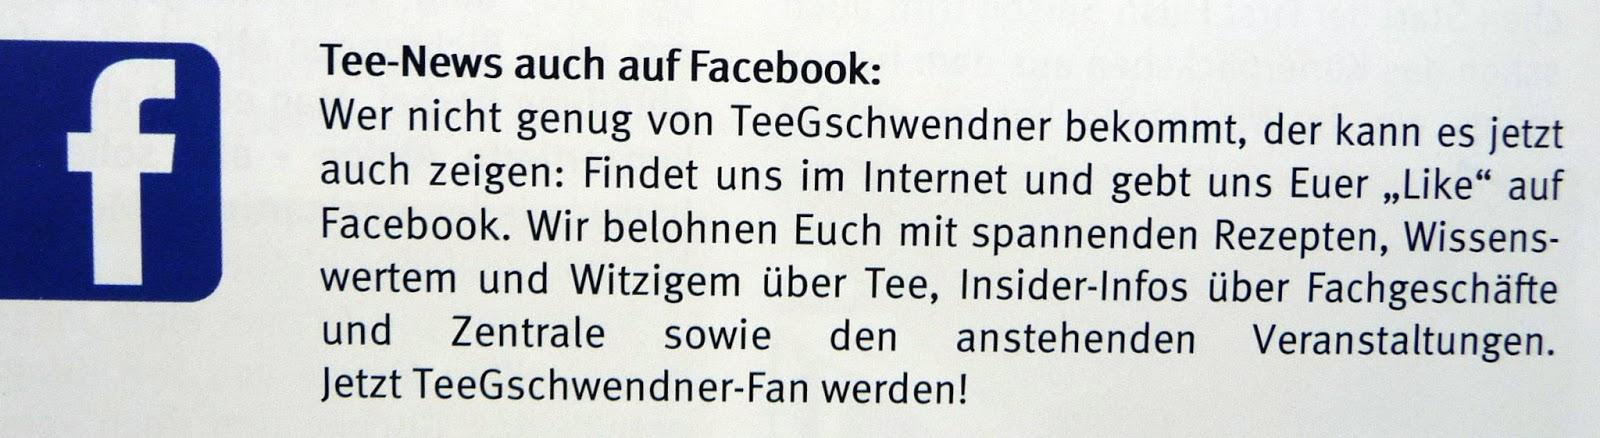 https://www.facebook.com/TeeGschwendner?fref=ts